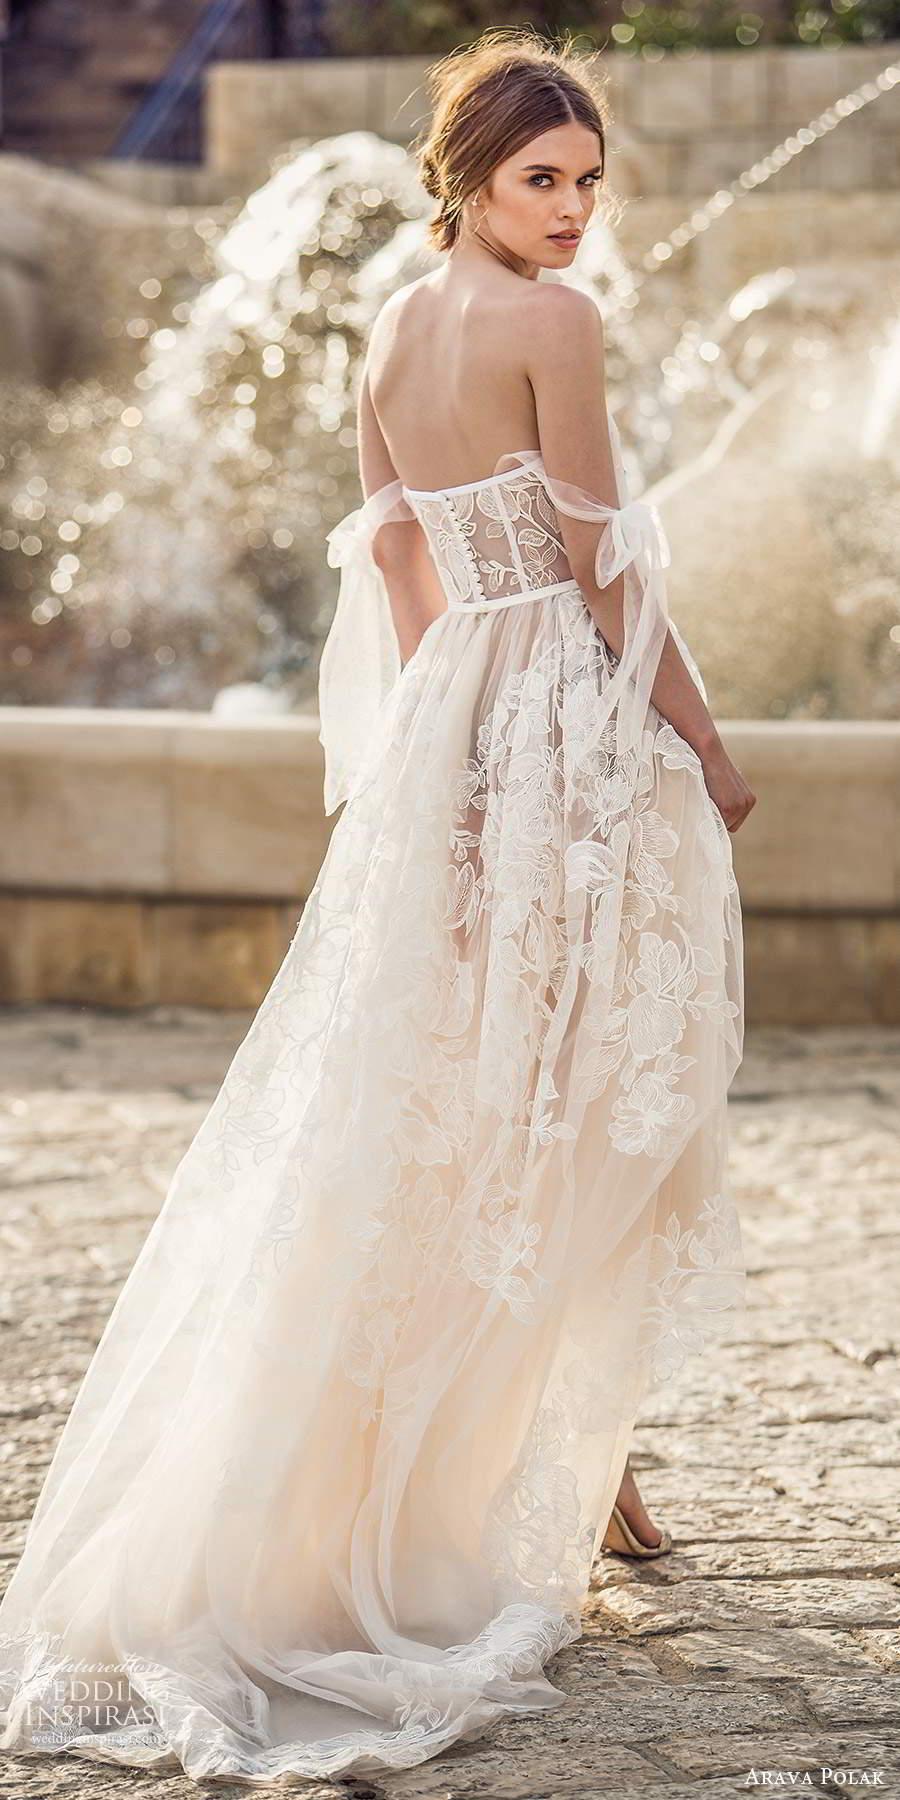 arava polak 2021 bridal off shoulder swag sleeves sweetheart neckline fully embellished a line ball gown wedding dress chapel train (3) bv